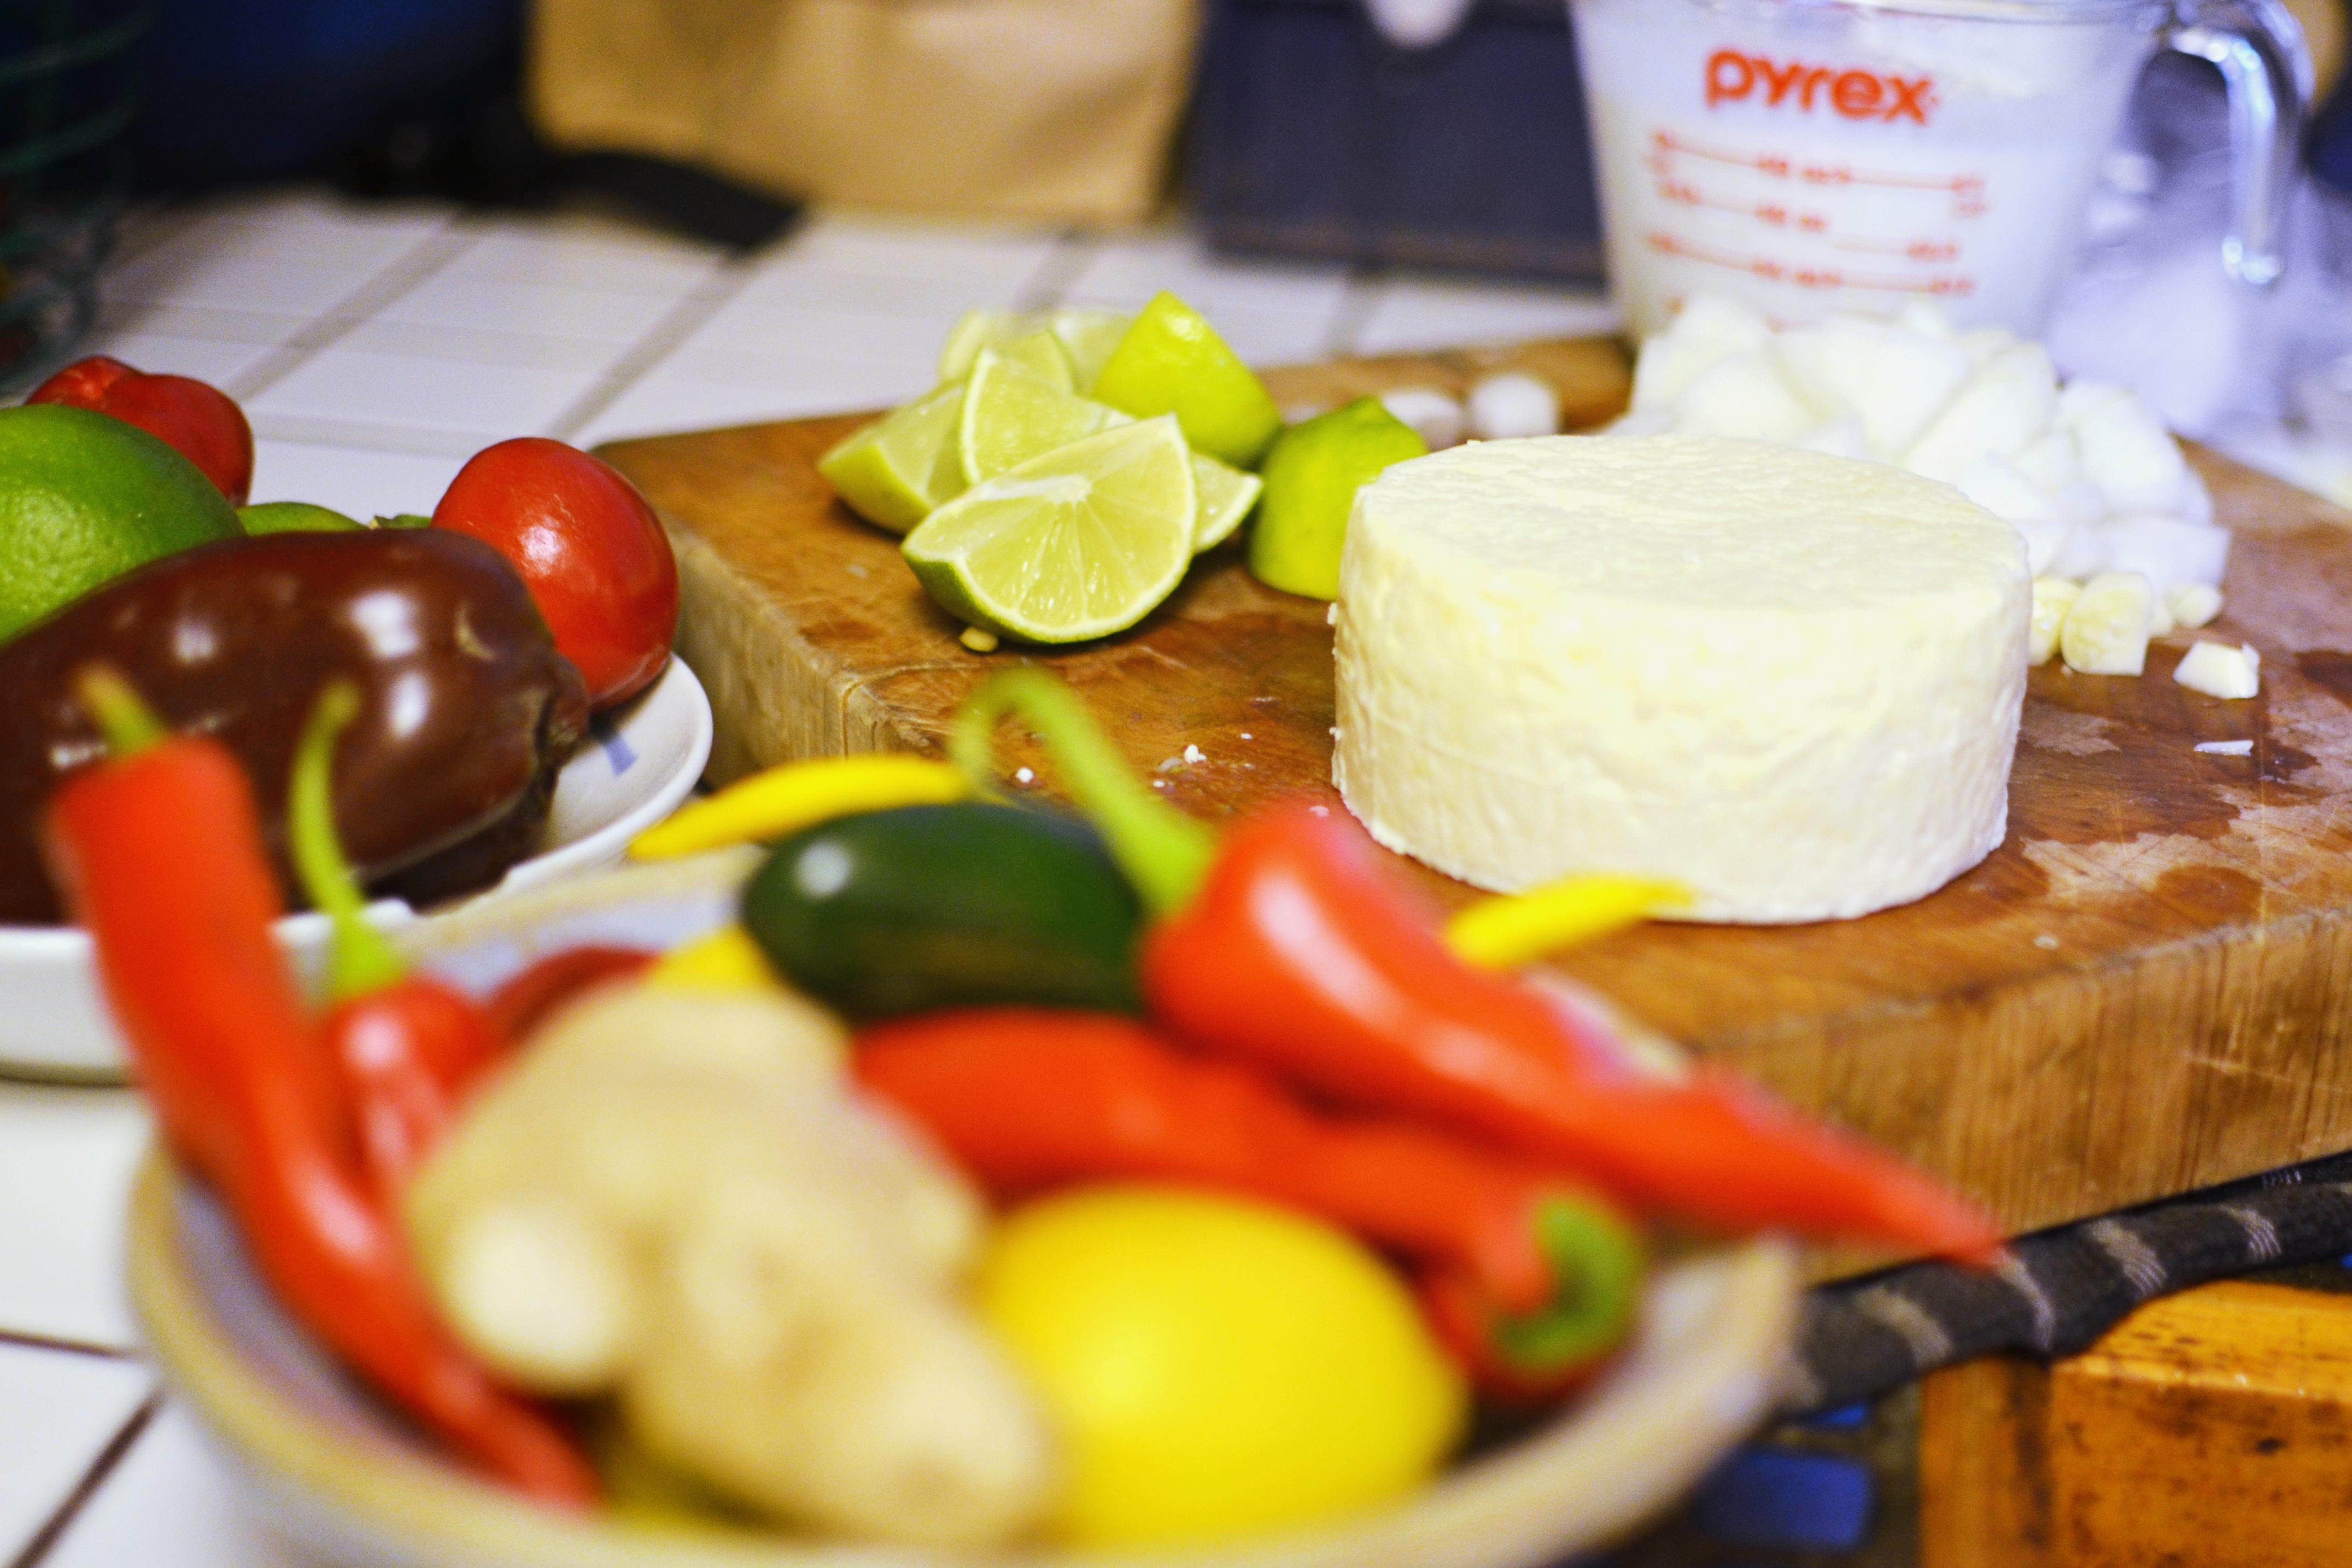 Fresh ingredients displayed on a cutting board